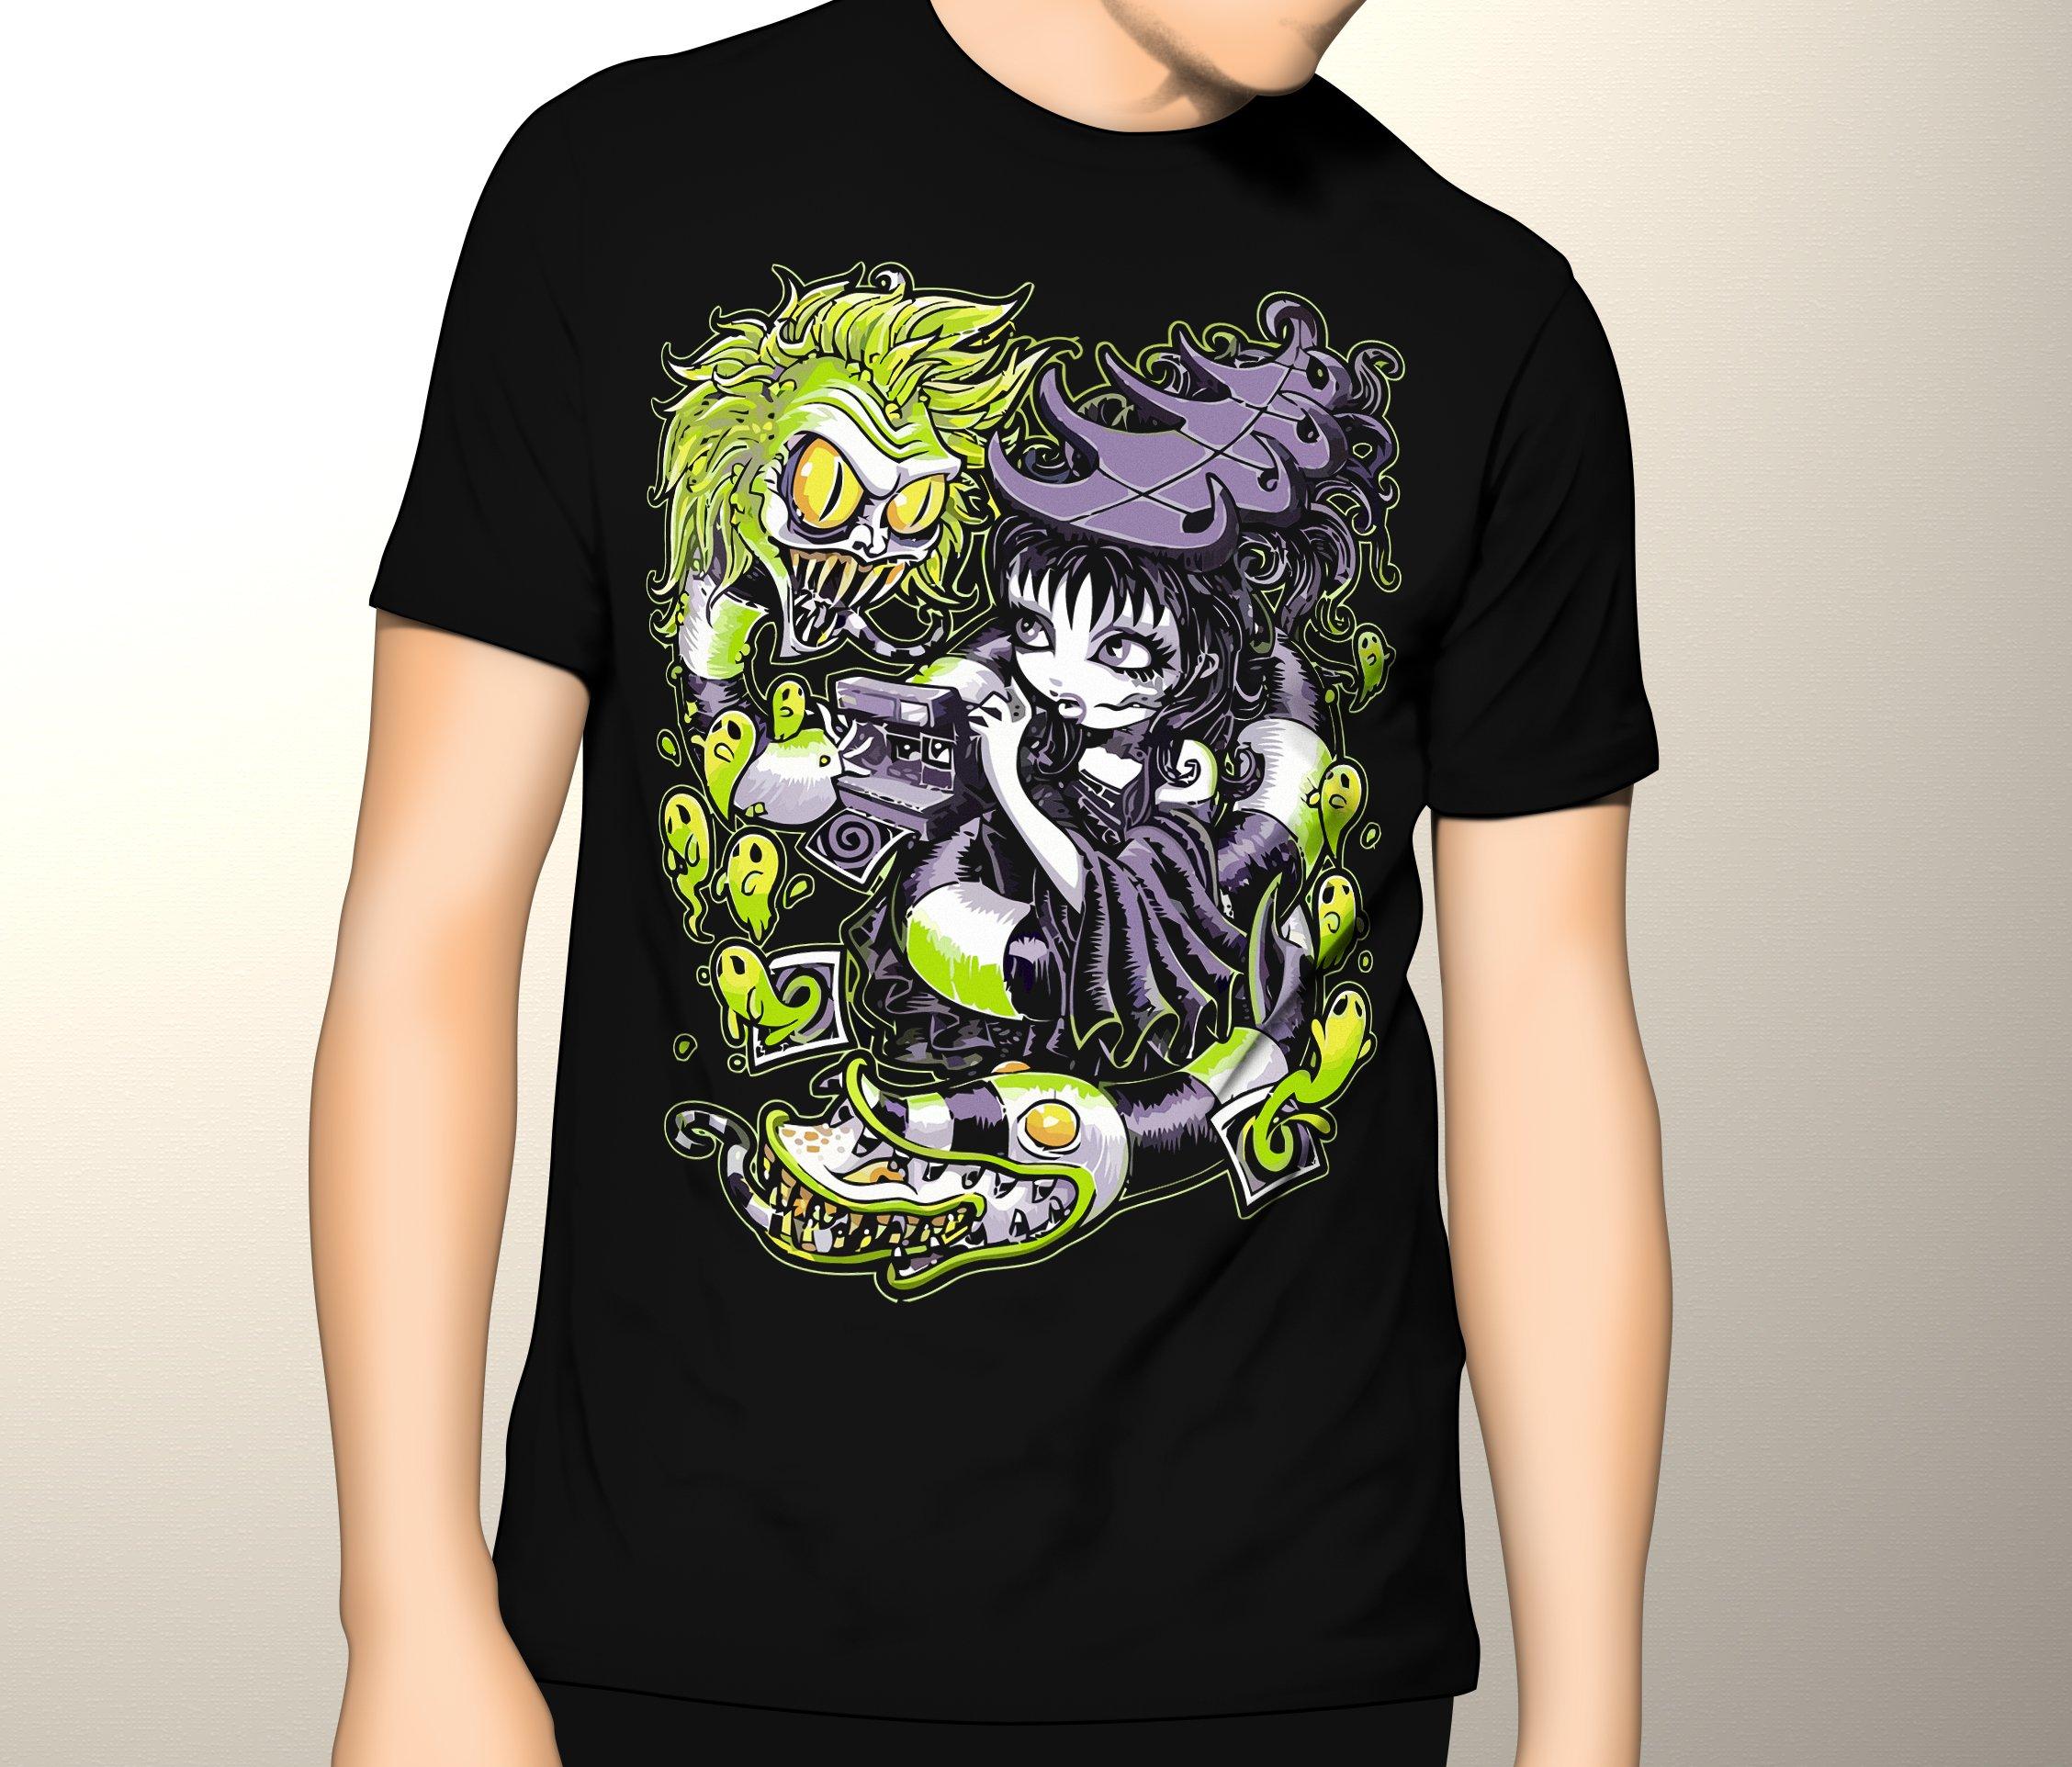 Beetlejuice Shirt, Snakes and Lydia, Gothic Shirt, Premium Graphic T-Shirt